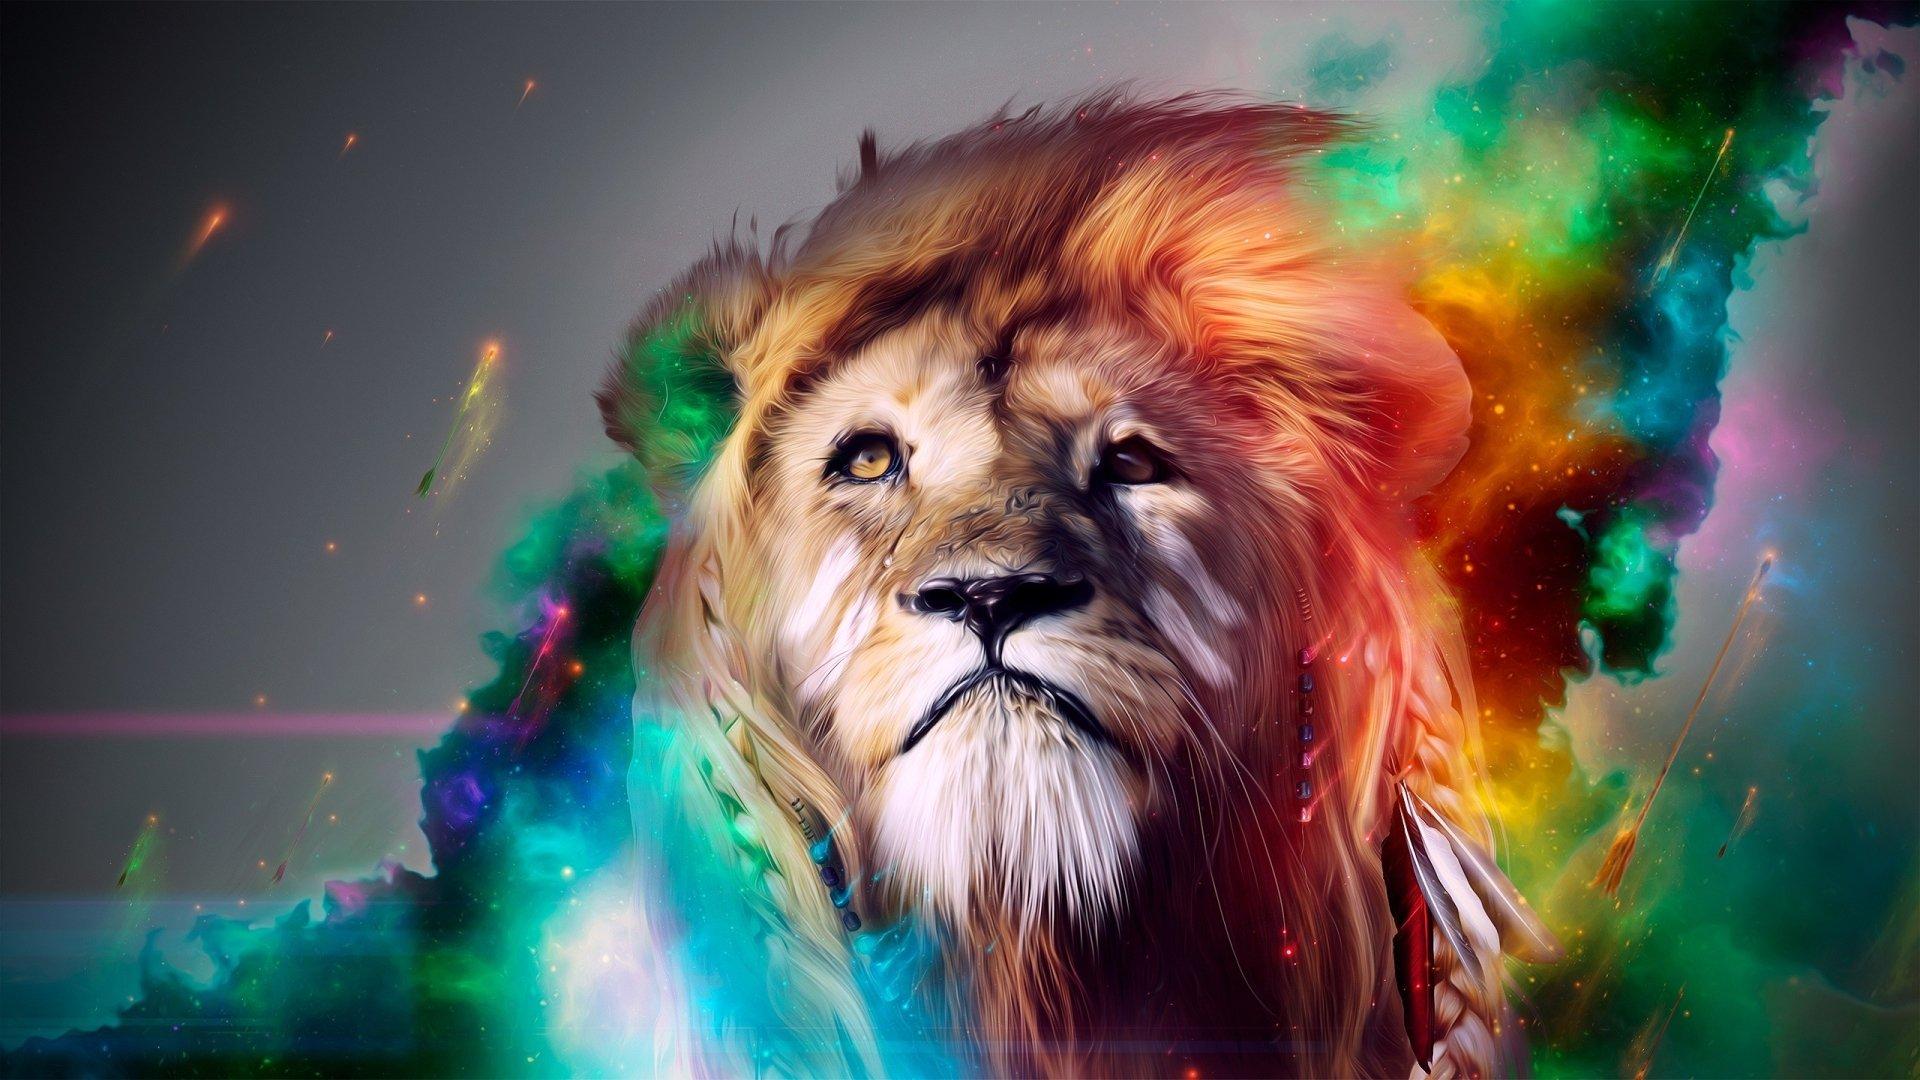 Animal - Lion  Animal Artistic Colorful Wallpaper